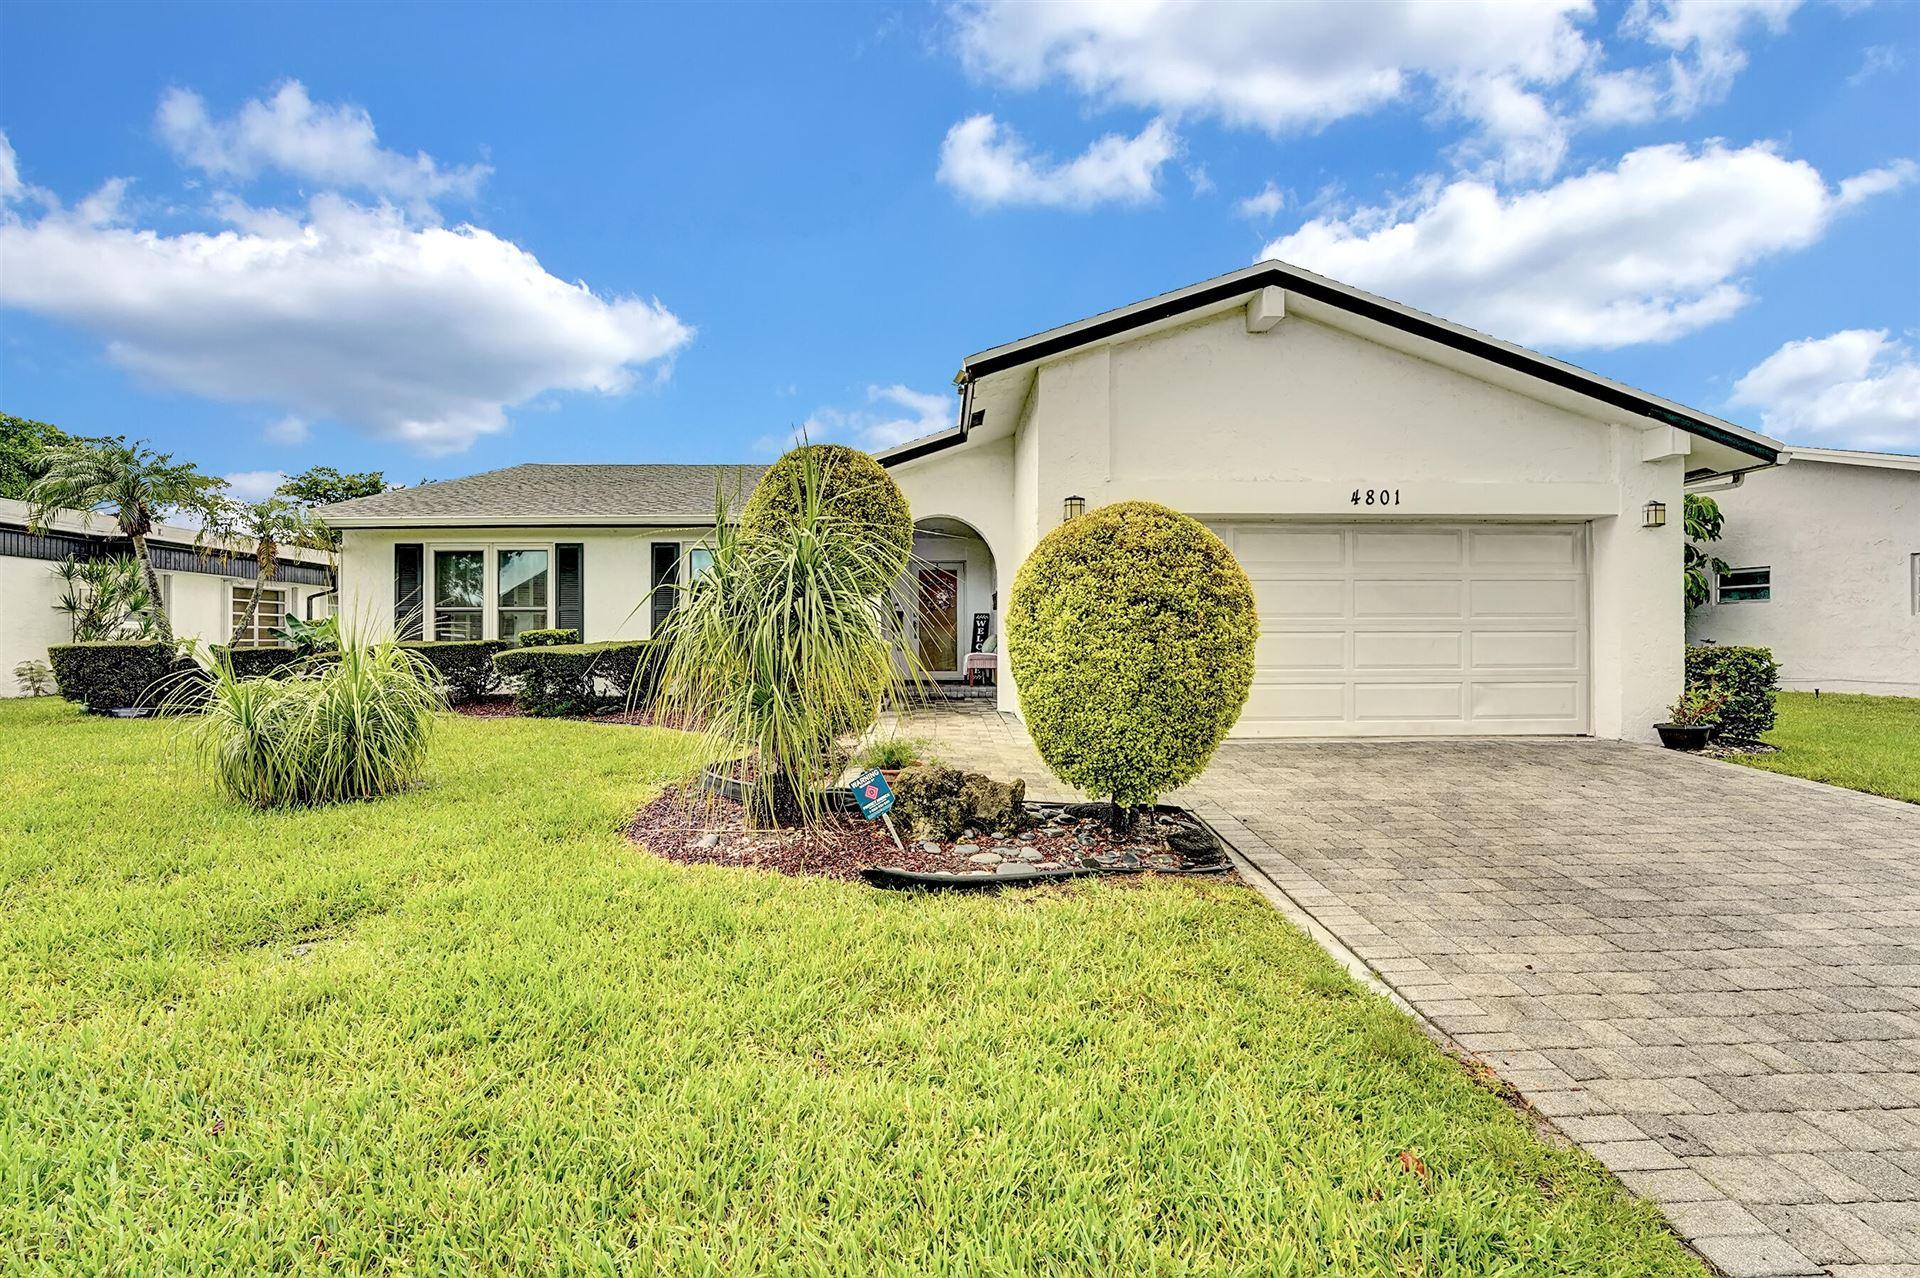 4801 Bayberry Lane, Tamarac, FL 33319 - MLS#: RX-10734103